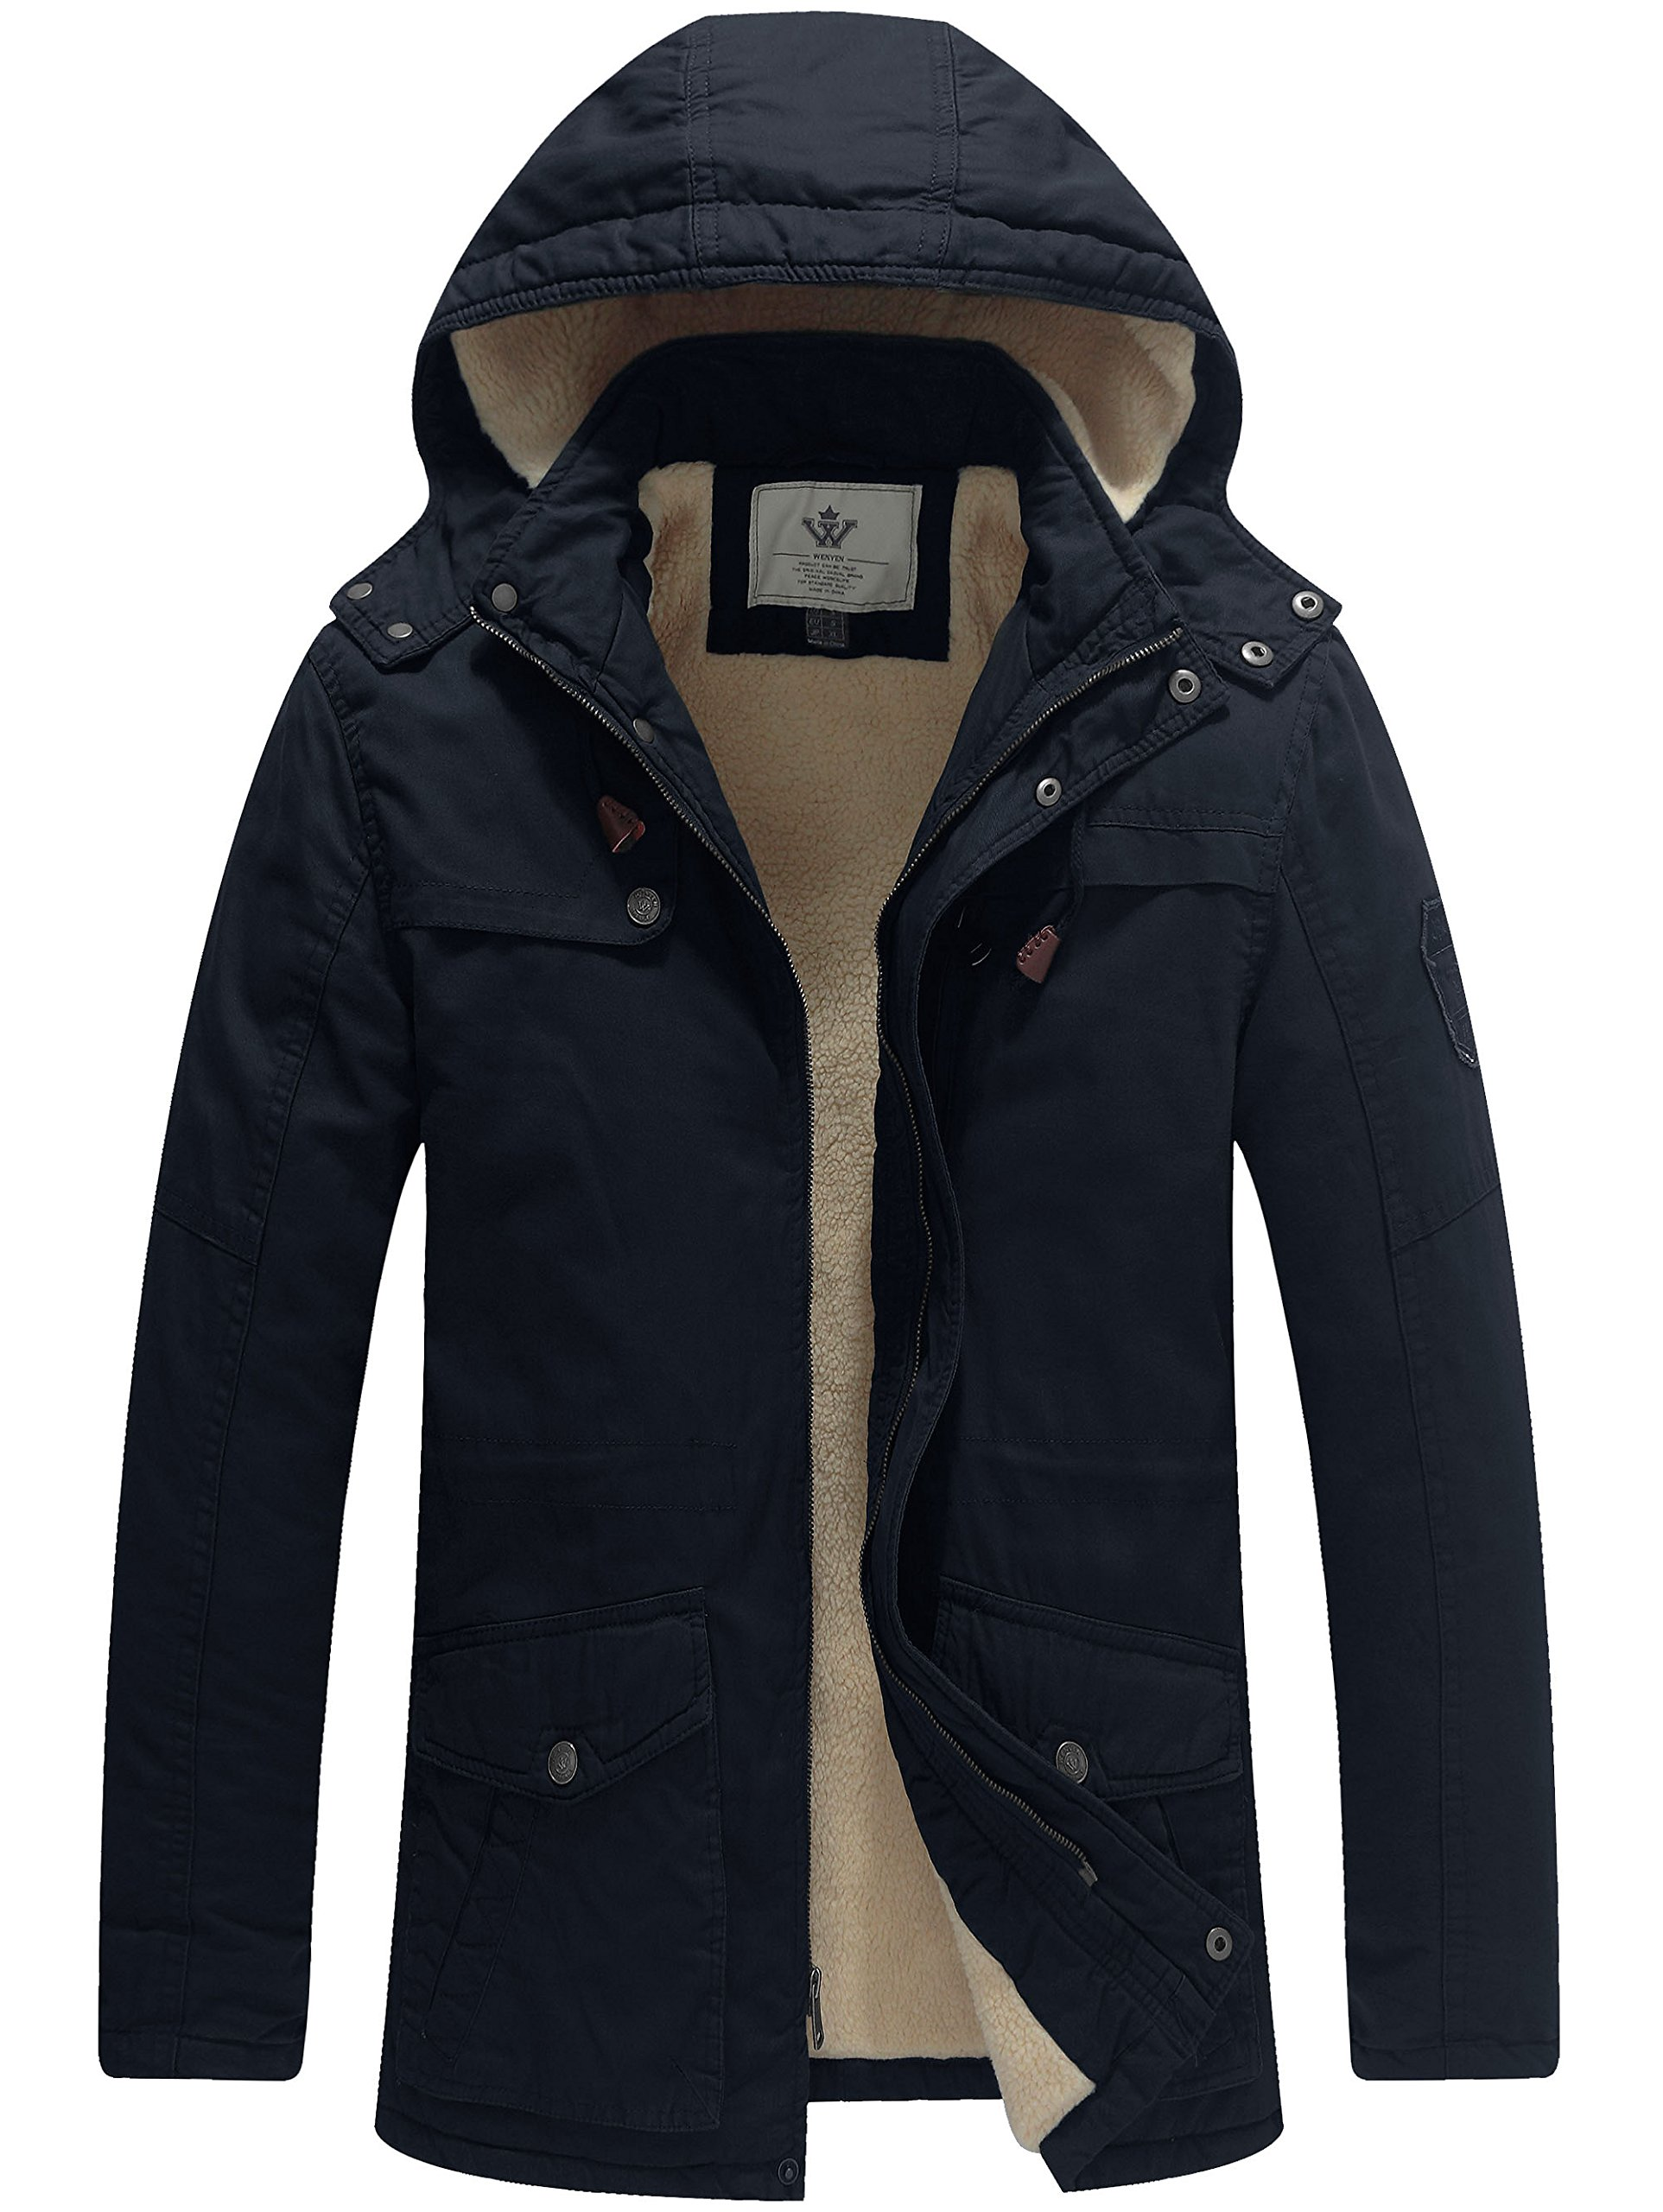 WenVen Men's Winter Washed Cotton Sherpa Lined Parka Jacket(Navy,Medium) by WenVen